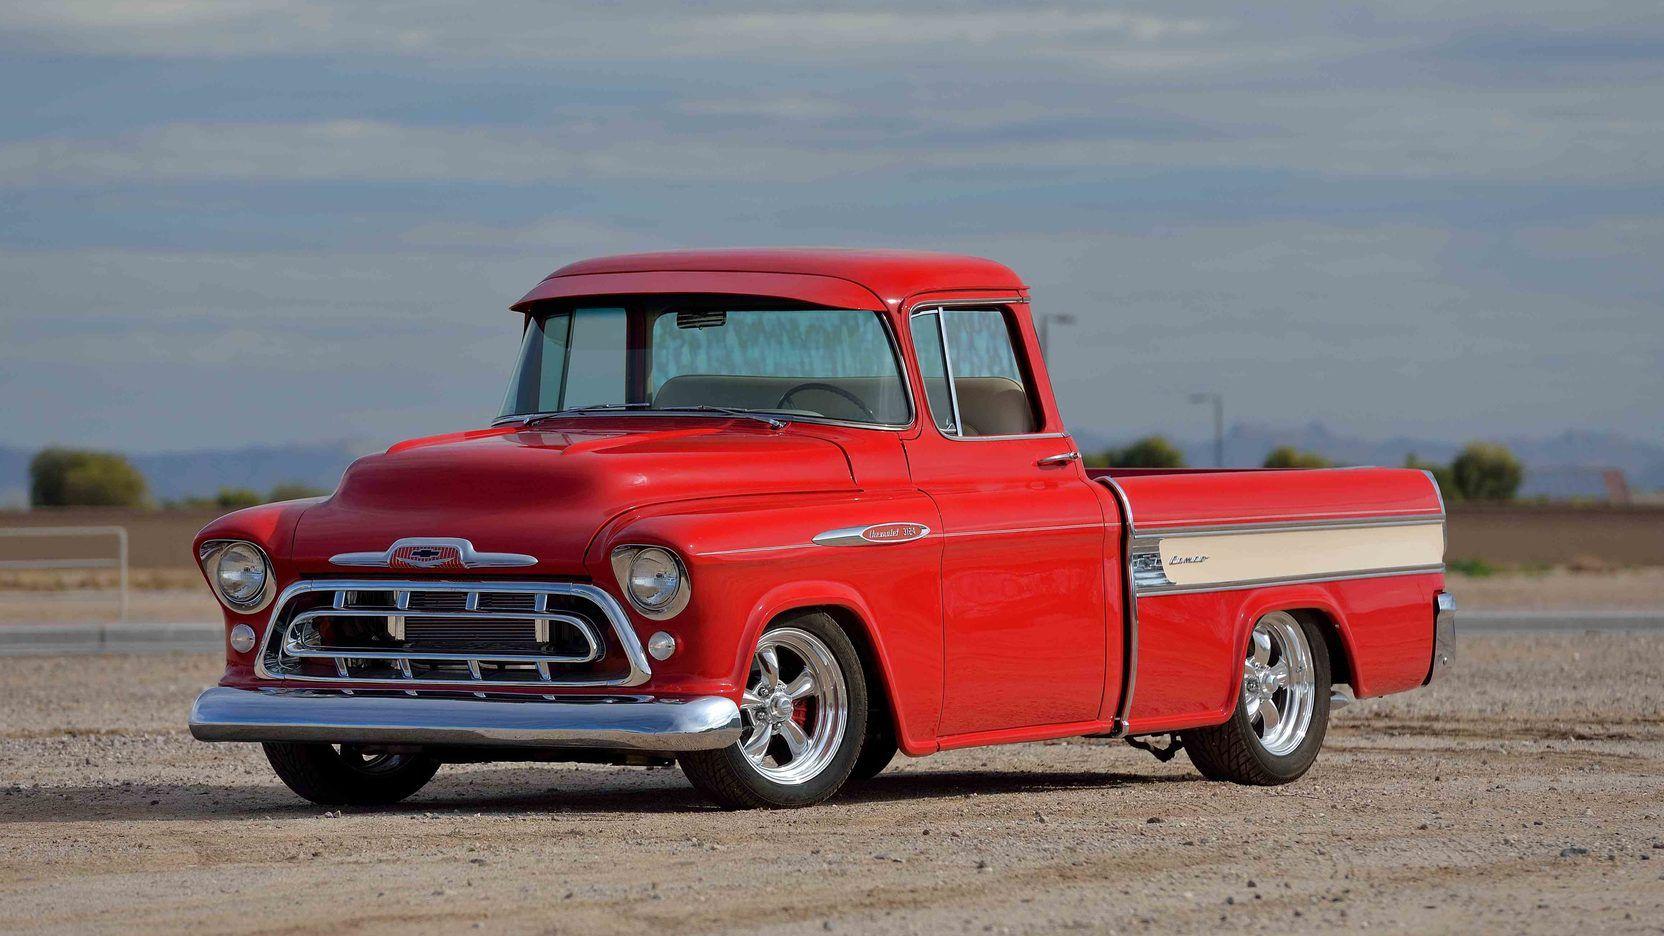 1958 Chevrolet Pickup presented as Lot S109.1 at Pomona